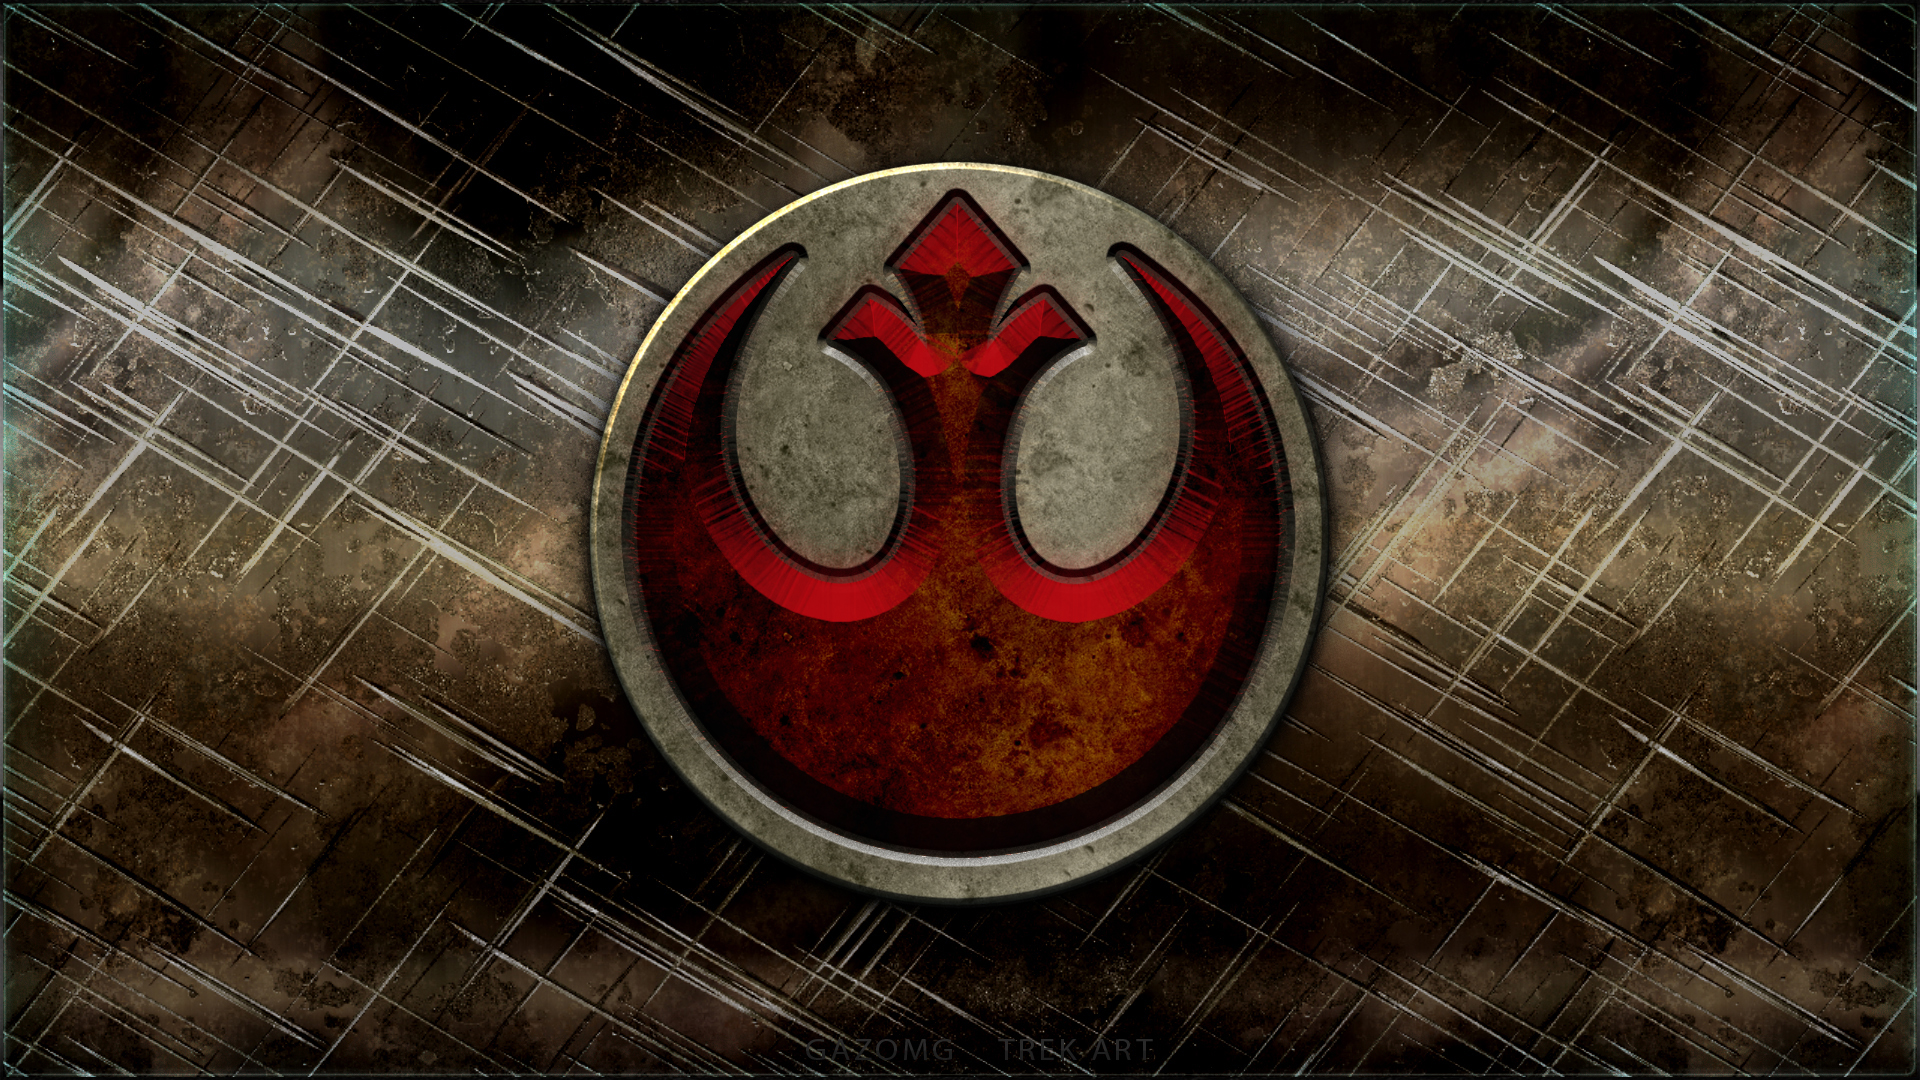 Star Wars Rebel Alliance Logo By Gazomg On Deviantart